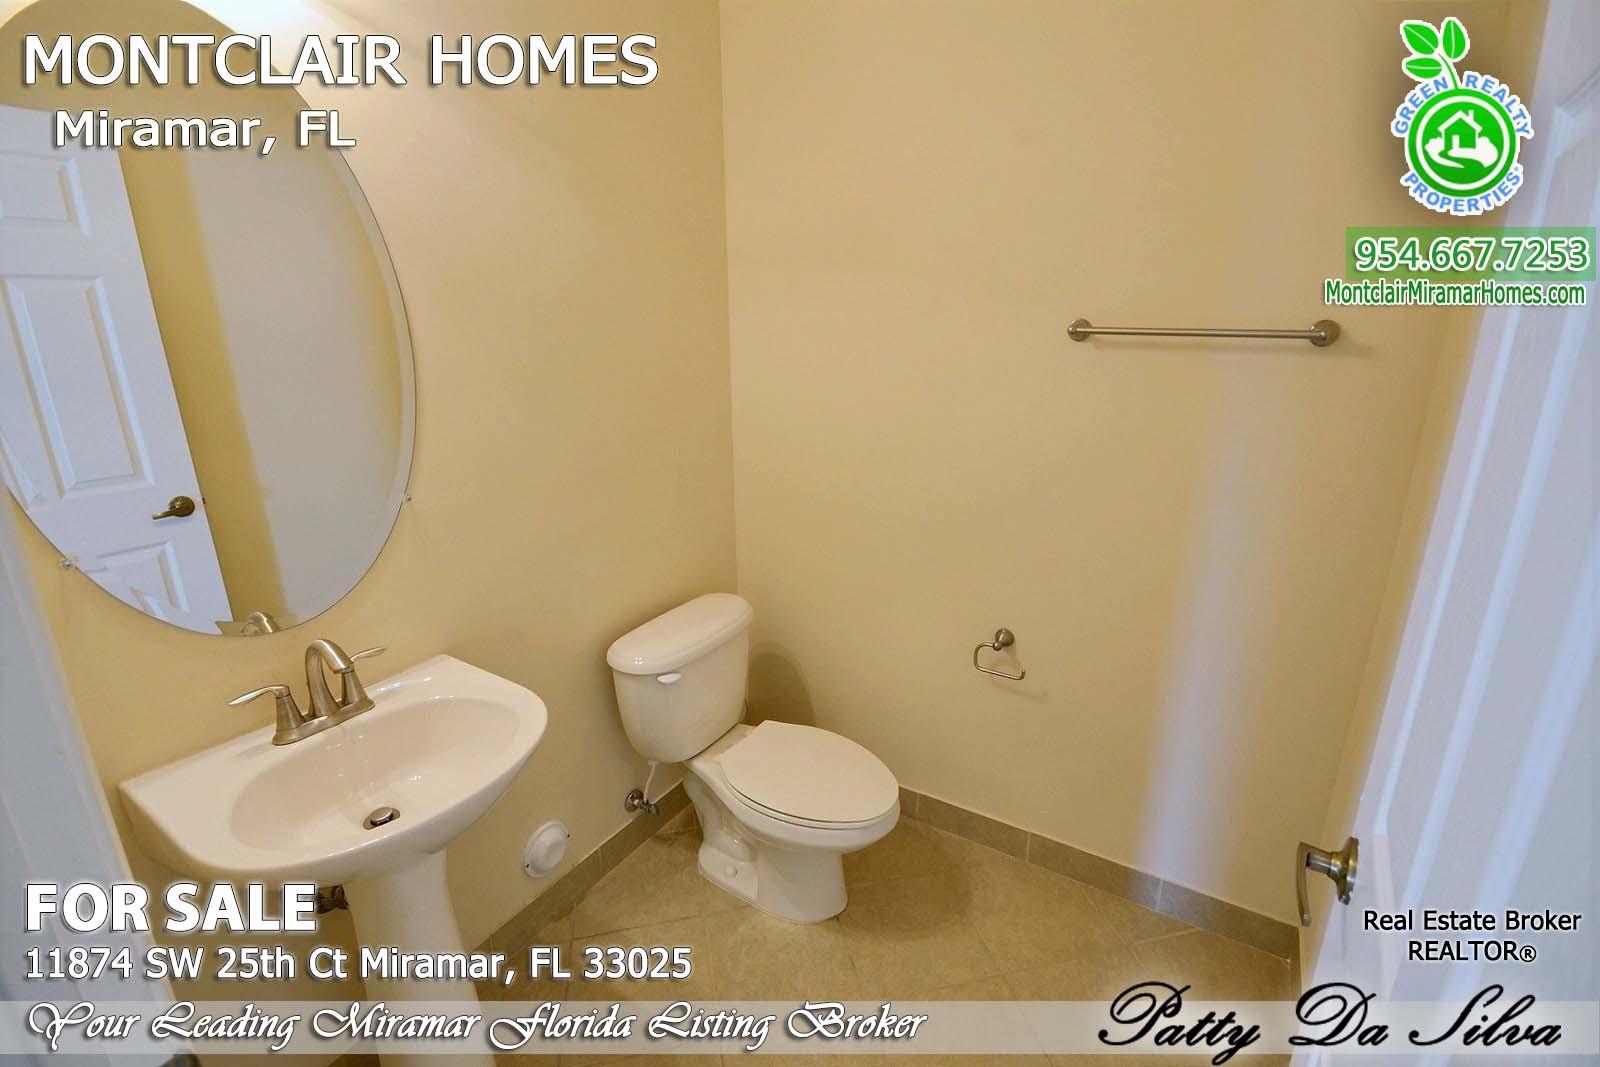 11874 SW 25 CT, Miramar FL 33025 - Montclair (8) - Copy